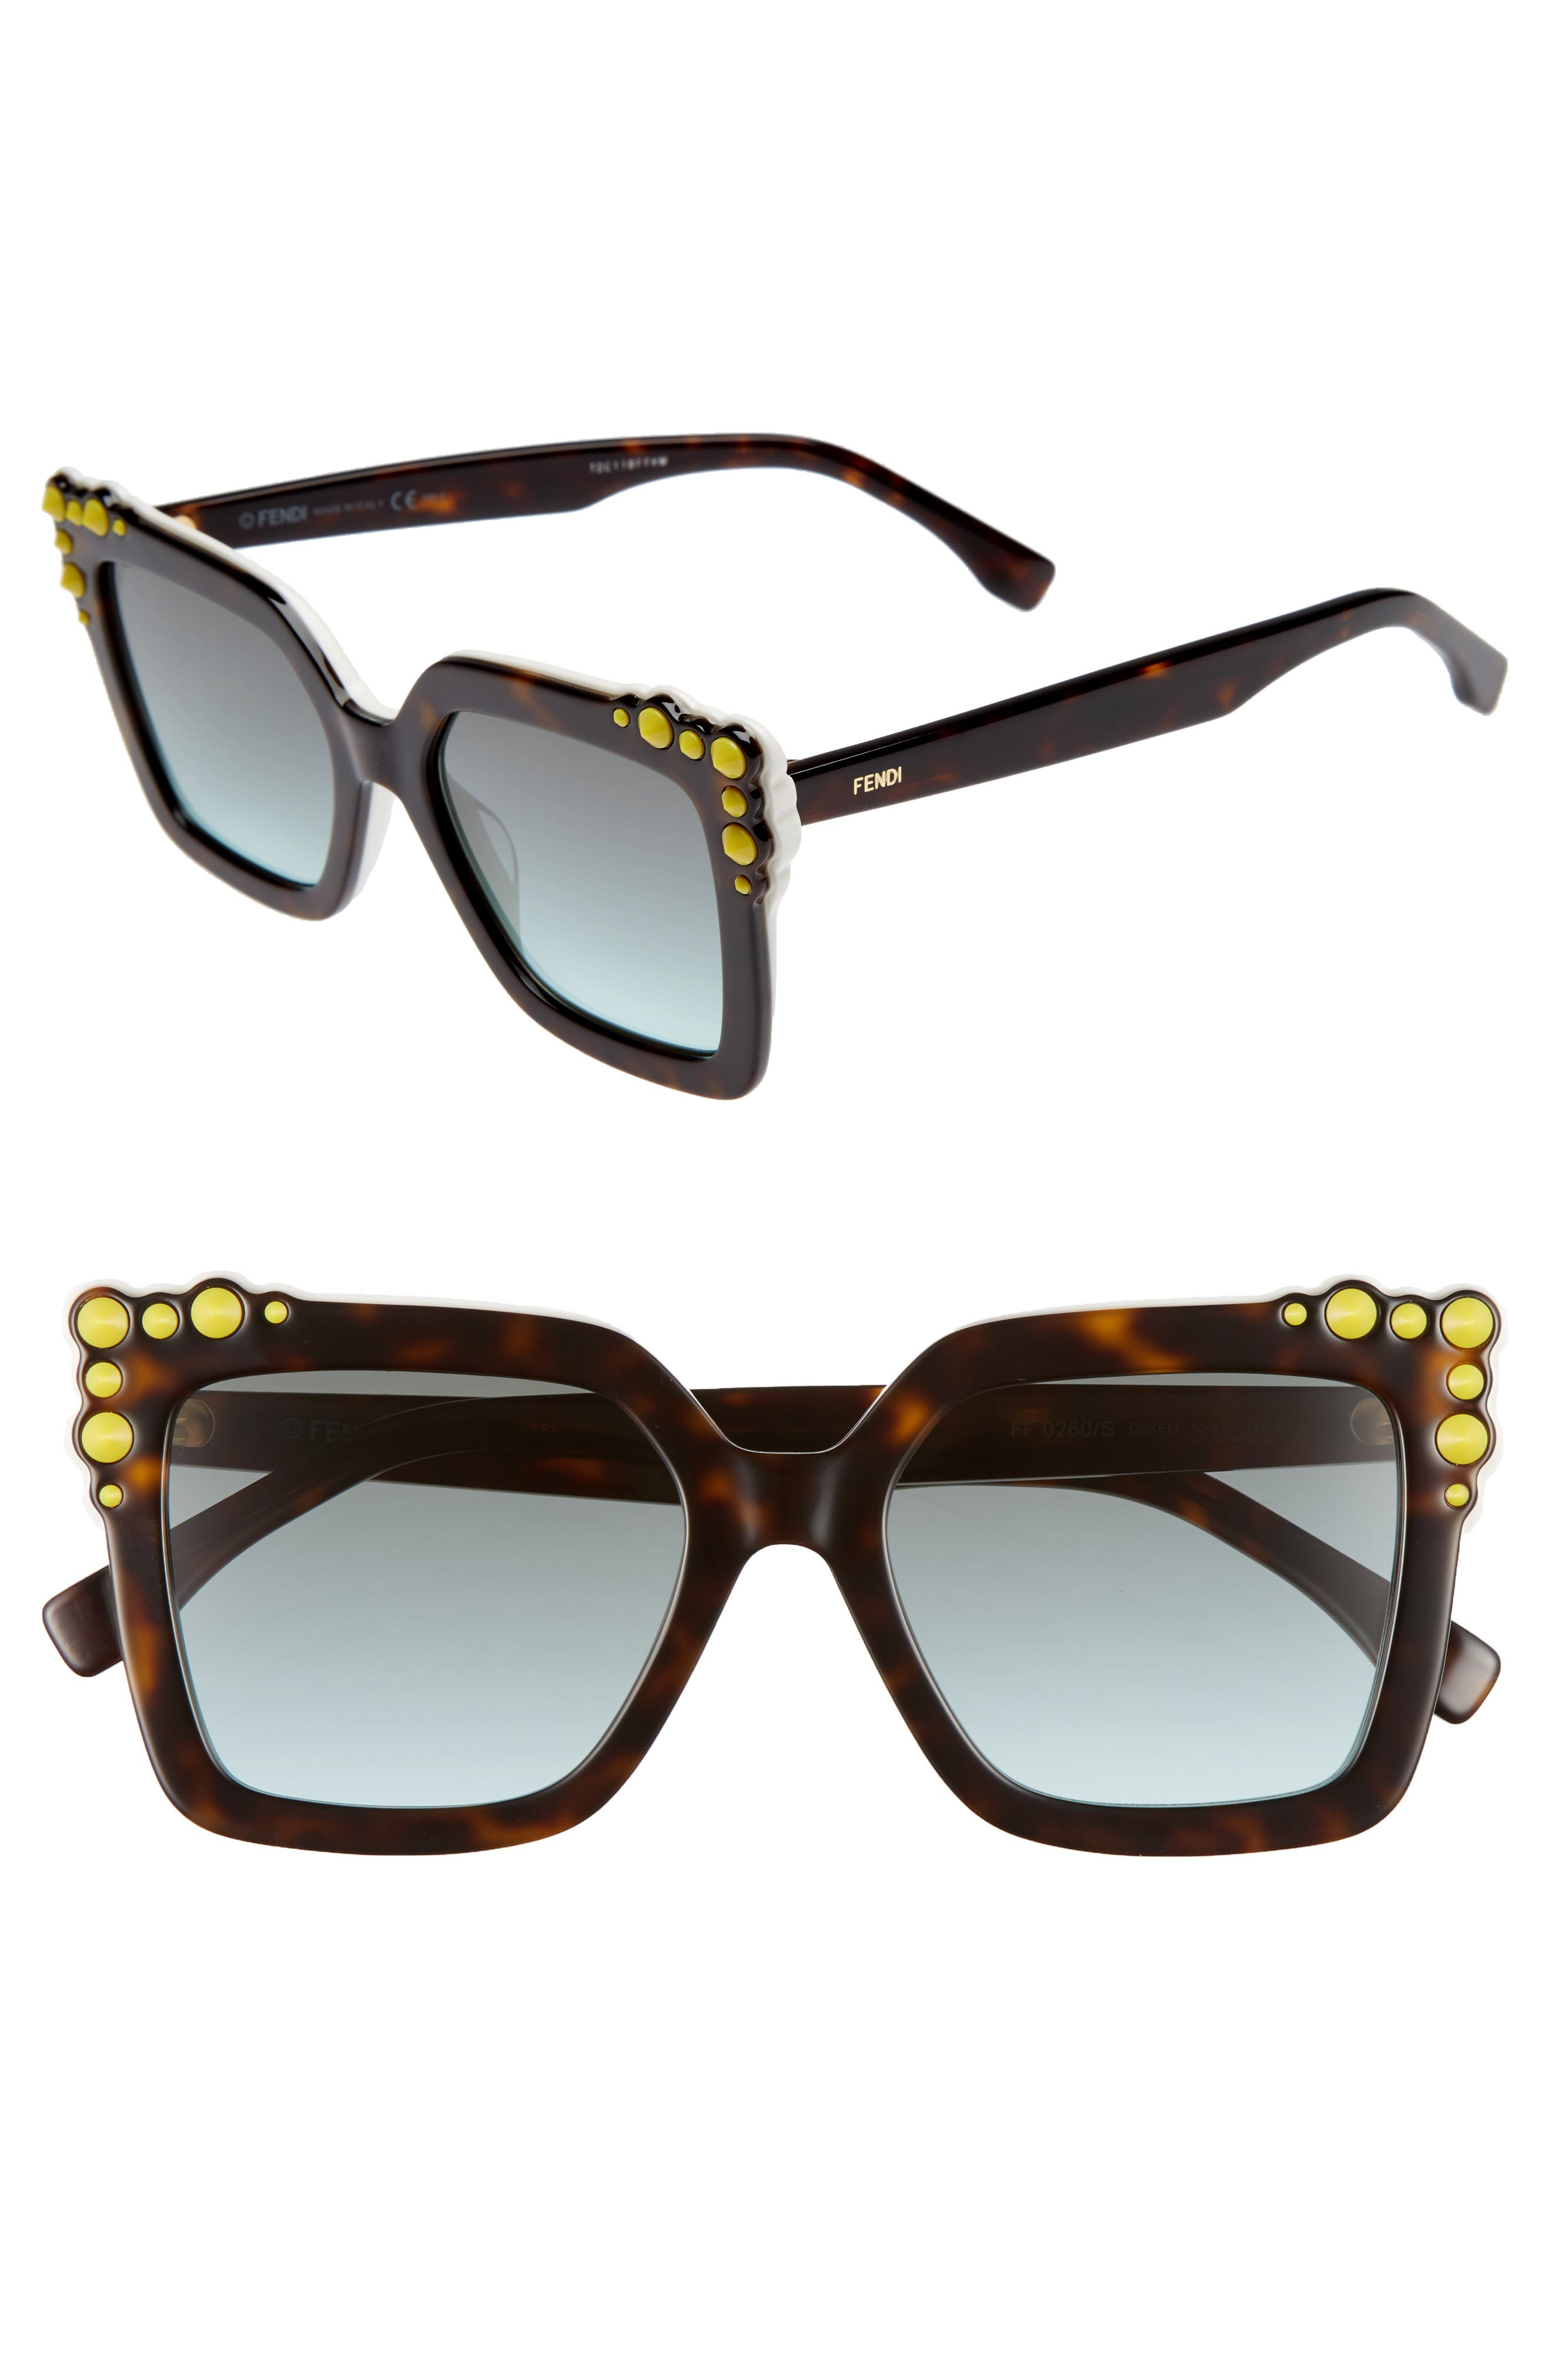 52mm Gradient Cat Eye Sunglasses,                         Main,                         color, Havana/ White